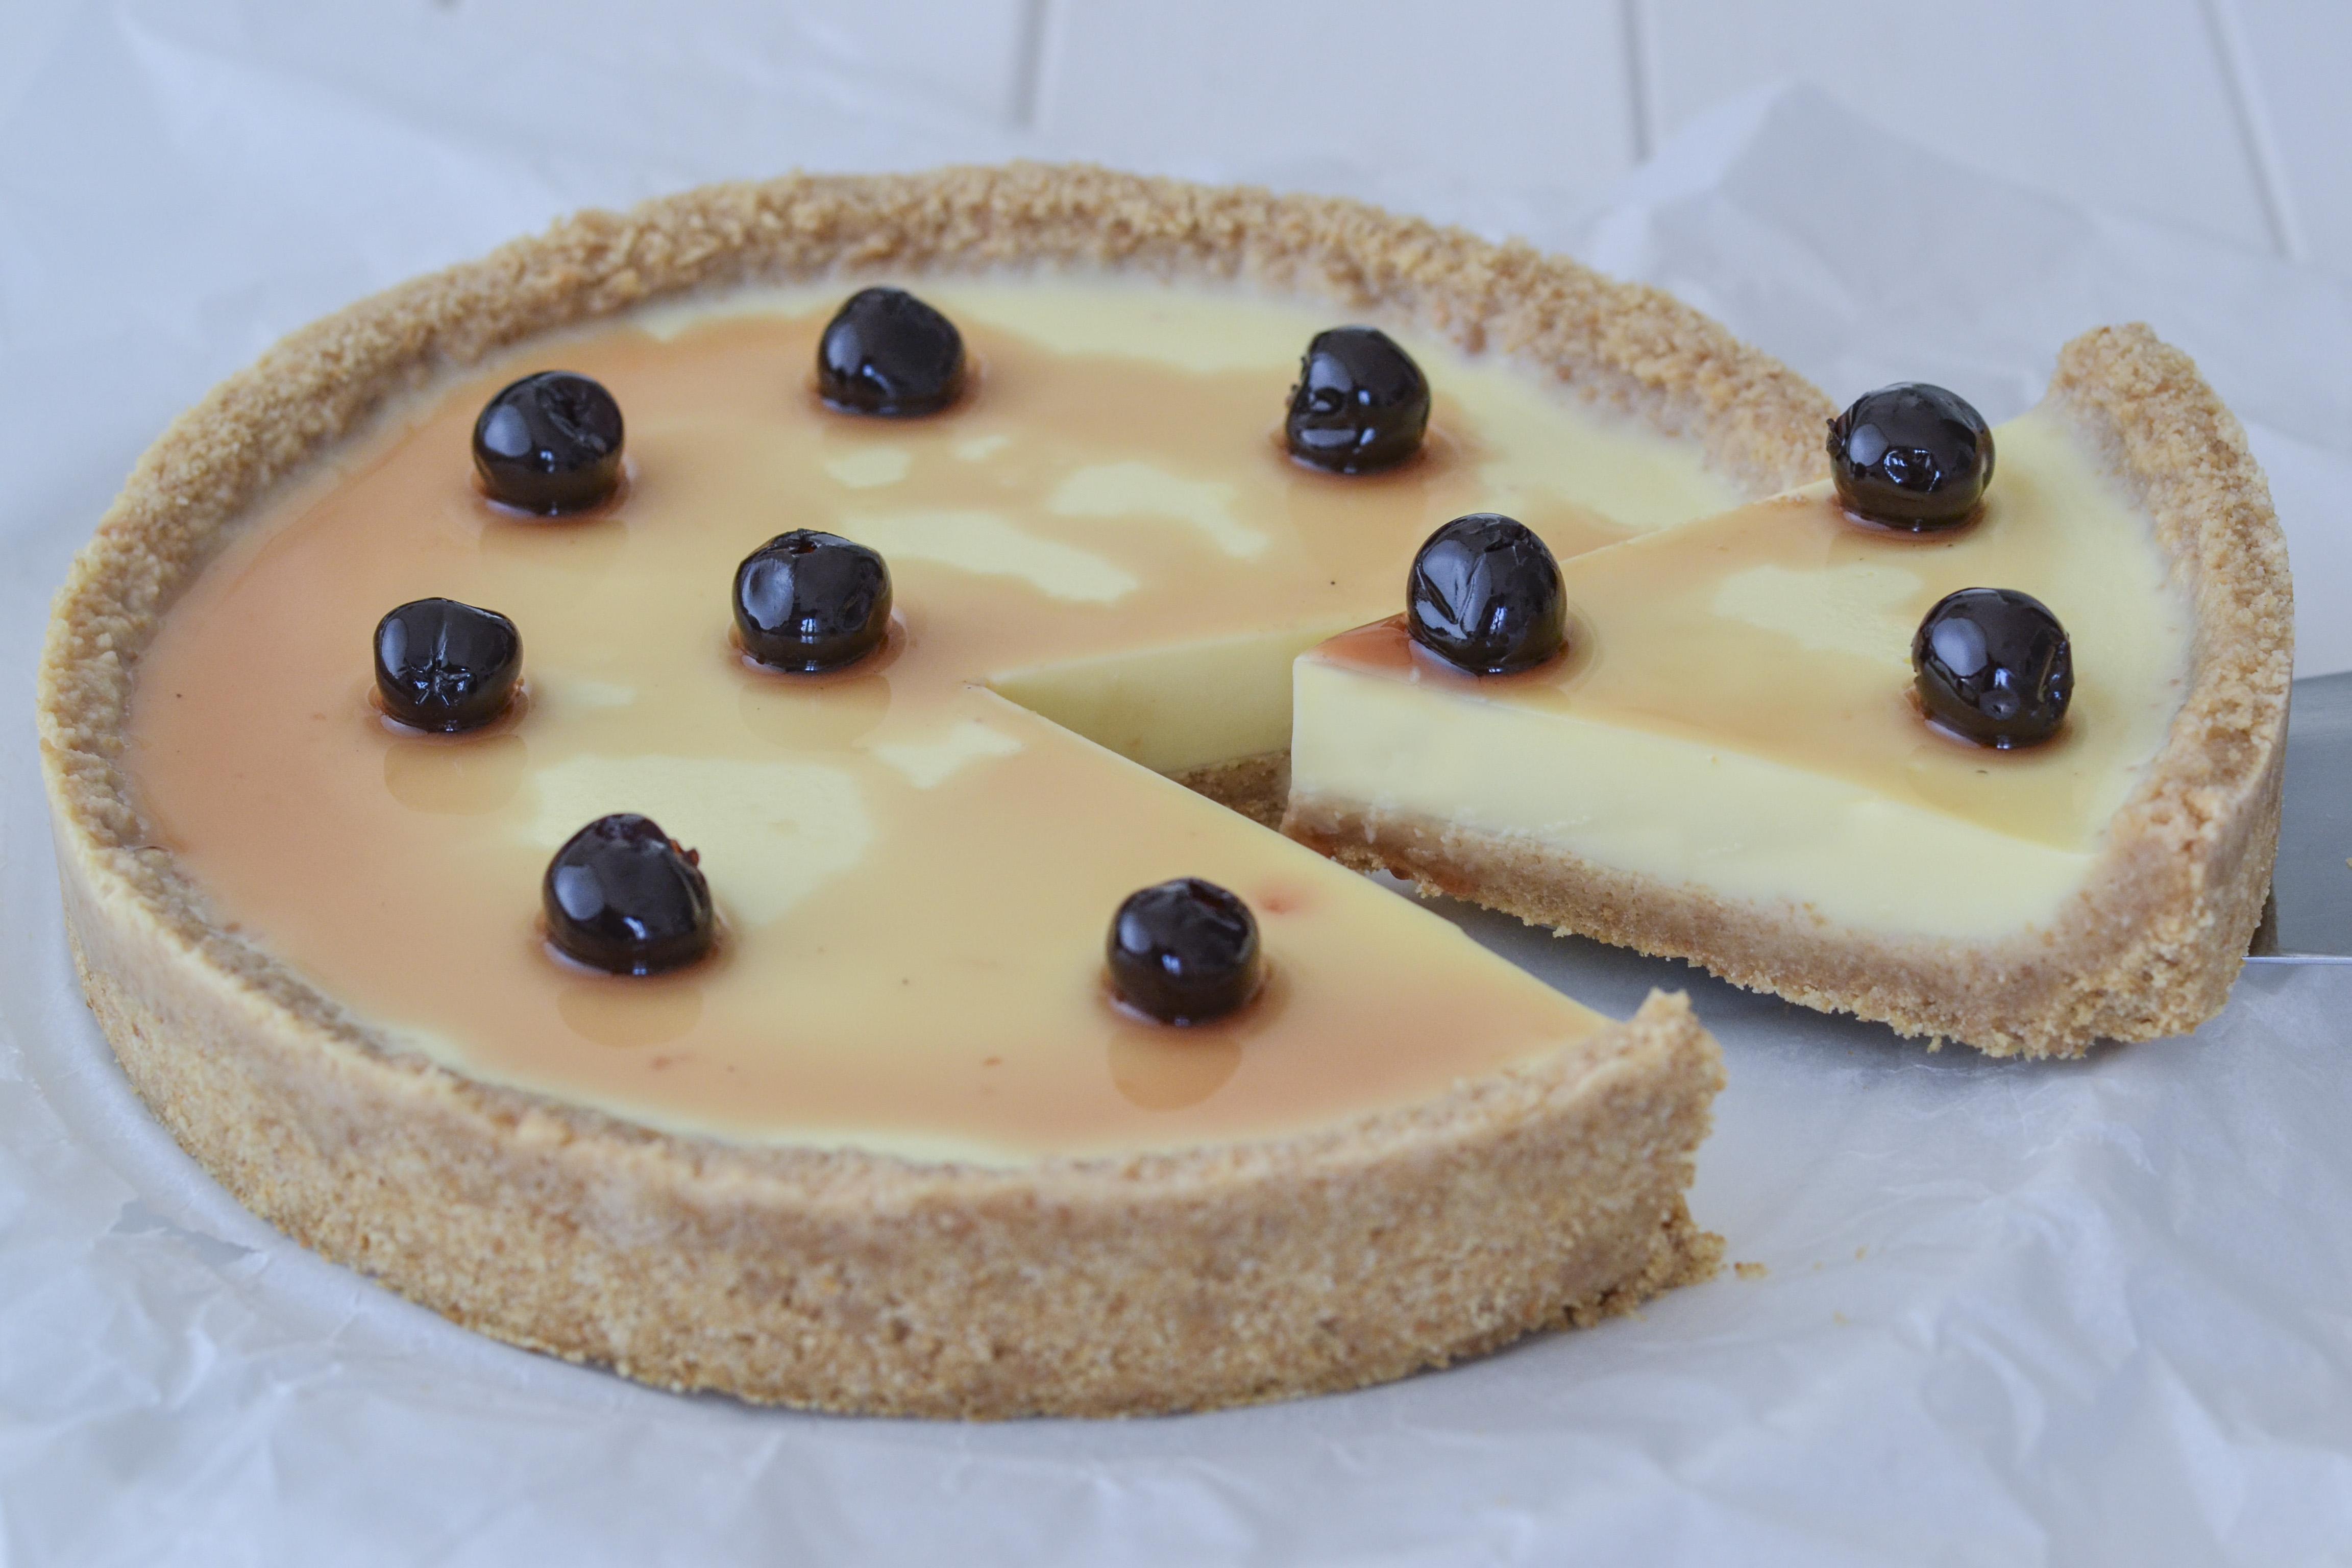 Ricetta Cheesecake Cotta.Cheesecake Panna Cotta Buonissima Ricetta Facile